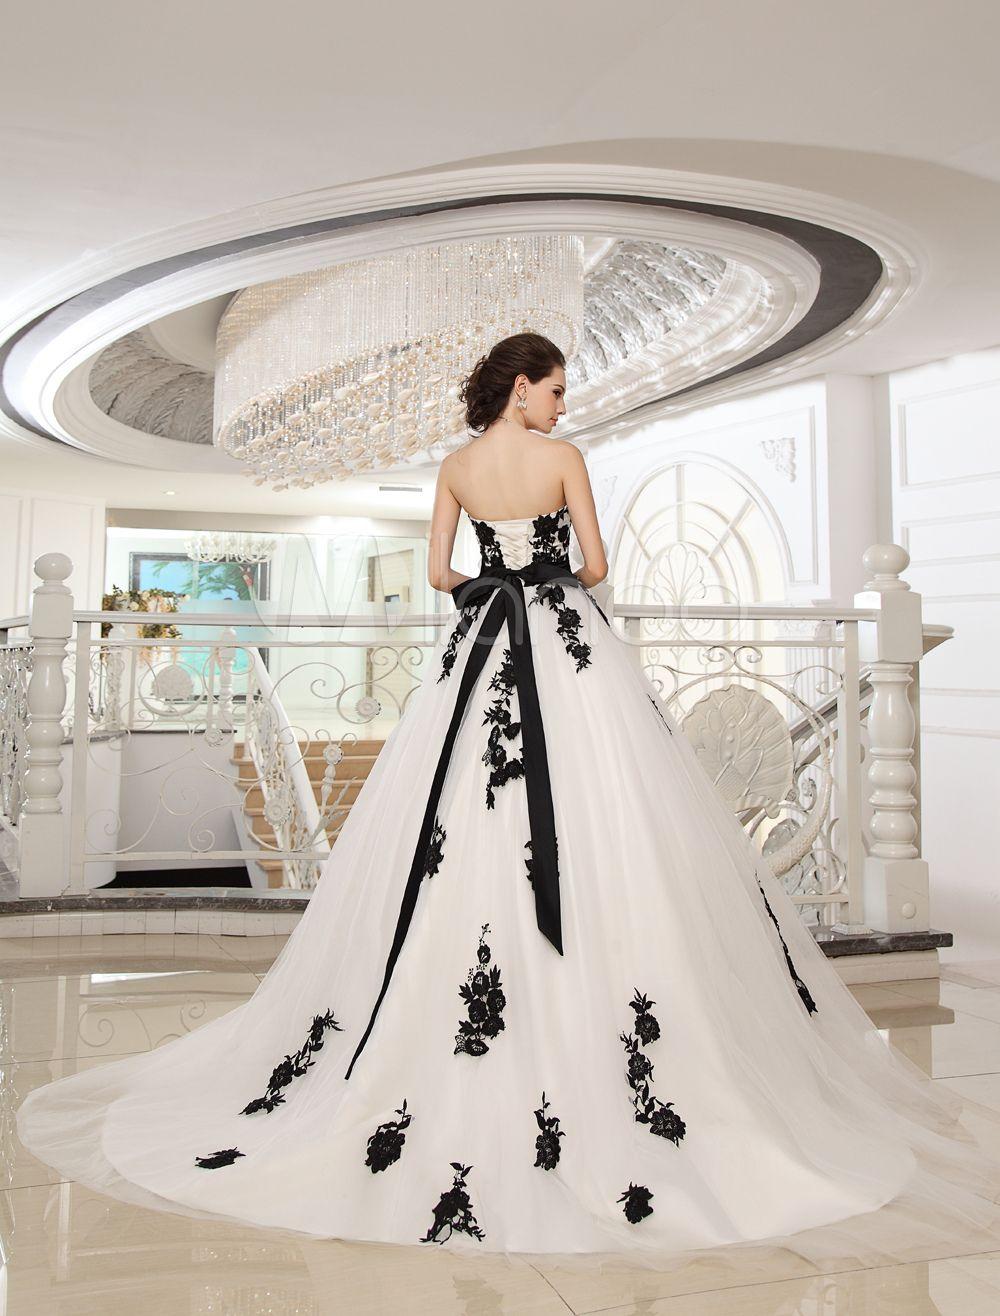 Wedding Dresses Strapless Black Bridal Gown Lace Applique Flowers Sash Beaded Court Train Ivory Tull Black Wedding Dresses Wedding Dresses Ebay Wedding Dresses [ 1316 x 1000 Pixel ]